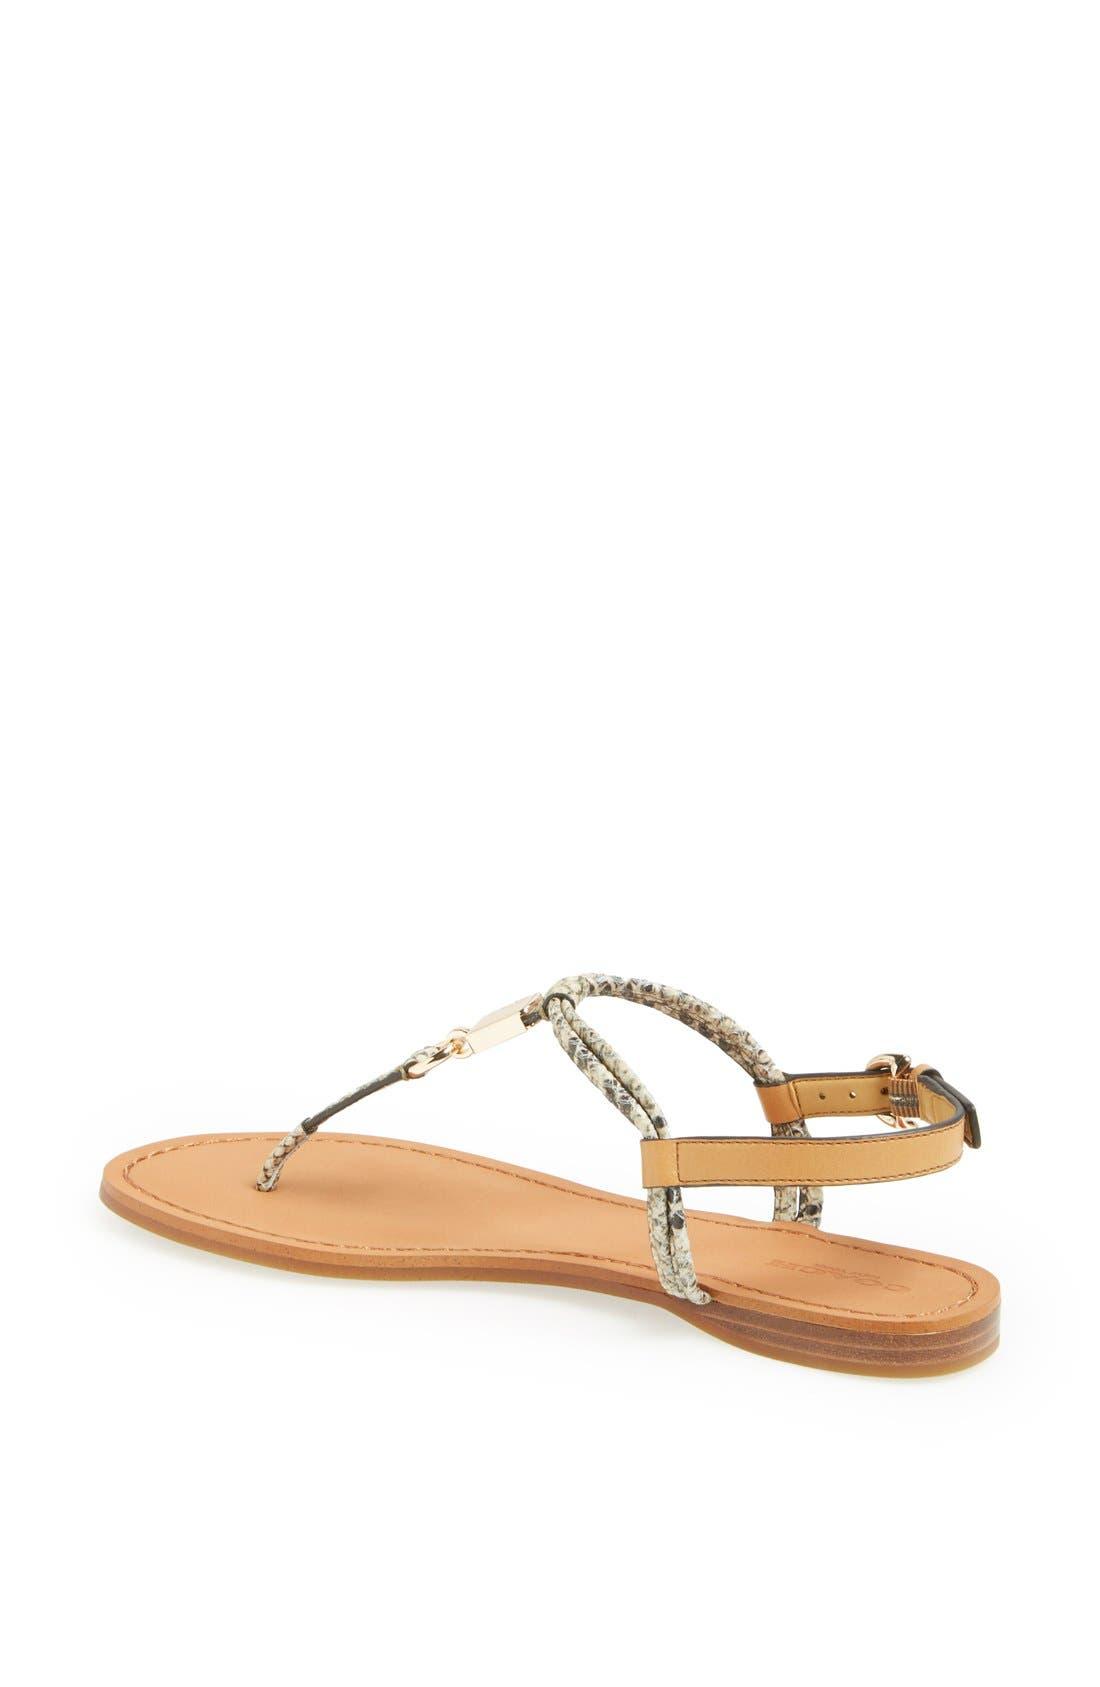 Alternate Image 2  - COACH 'Charleen' Leather Thong Sandal